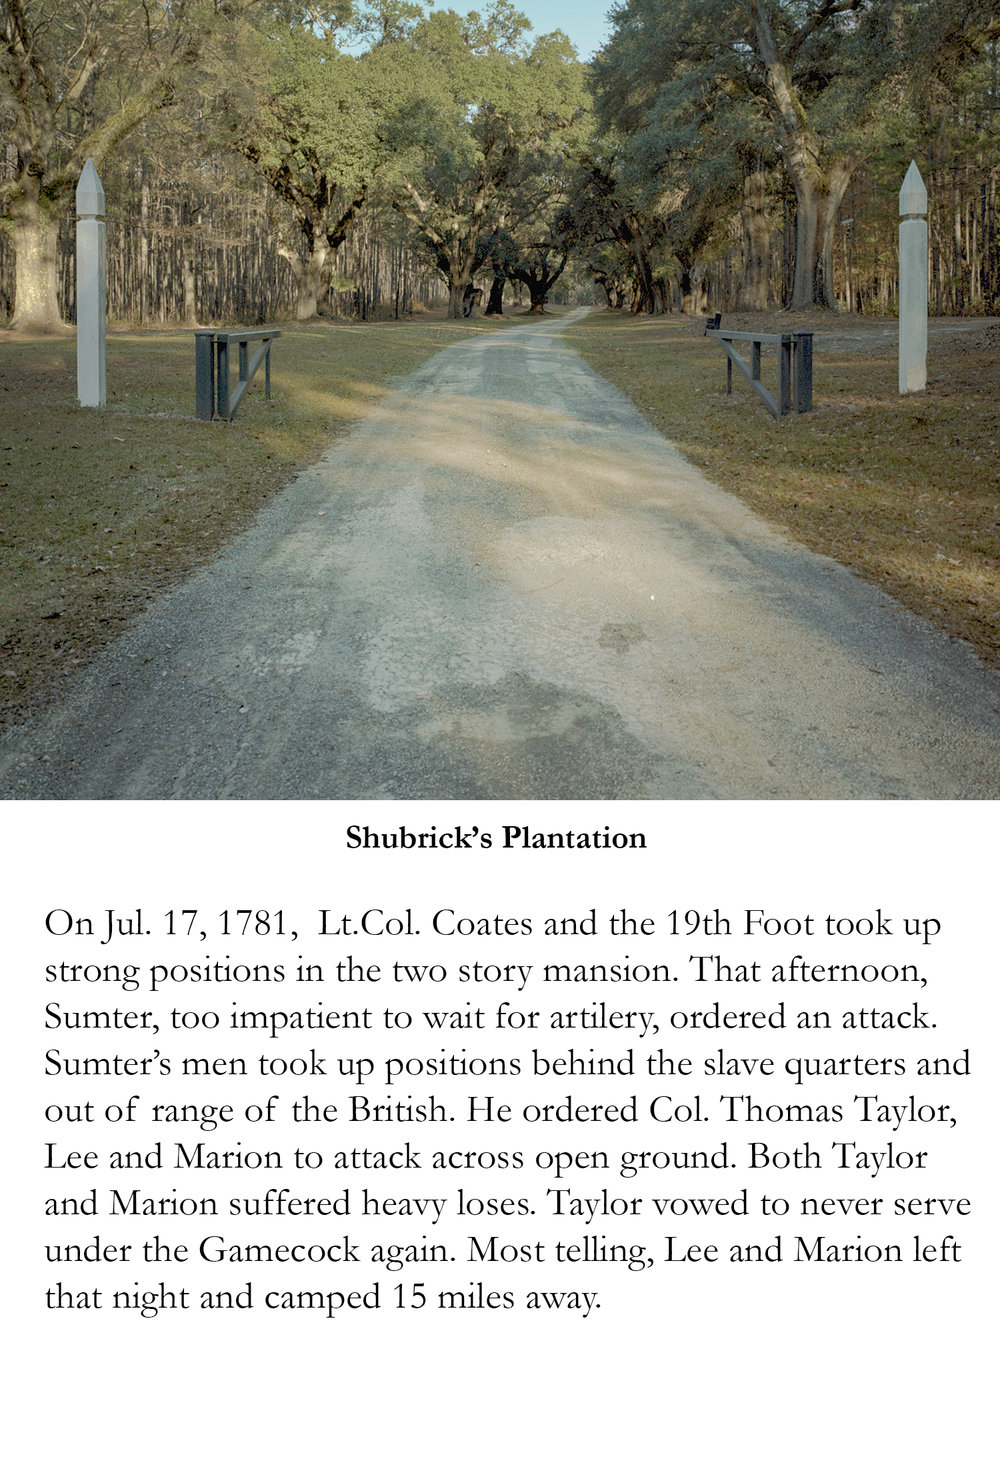 Shubrick's Plantation.jpg